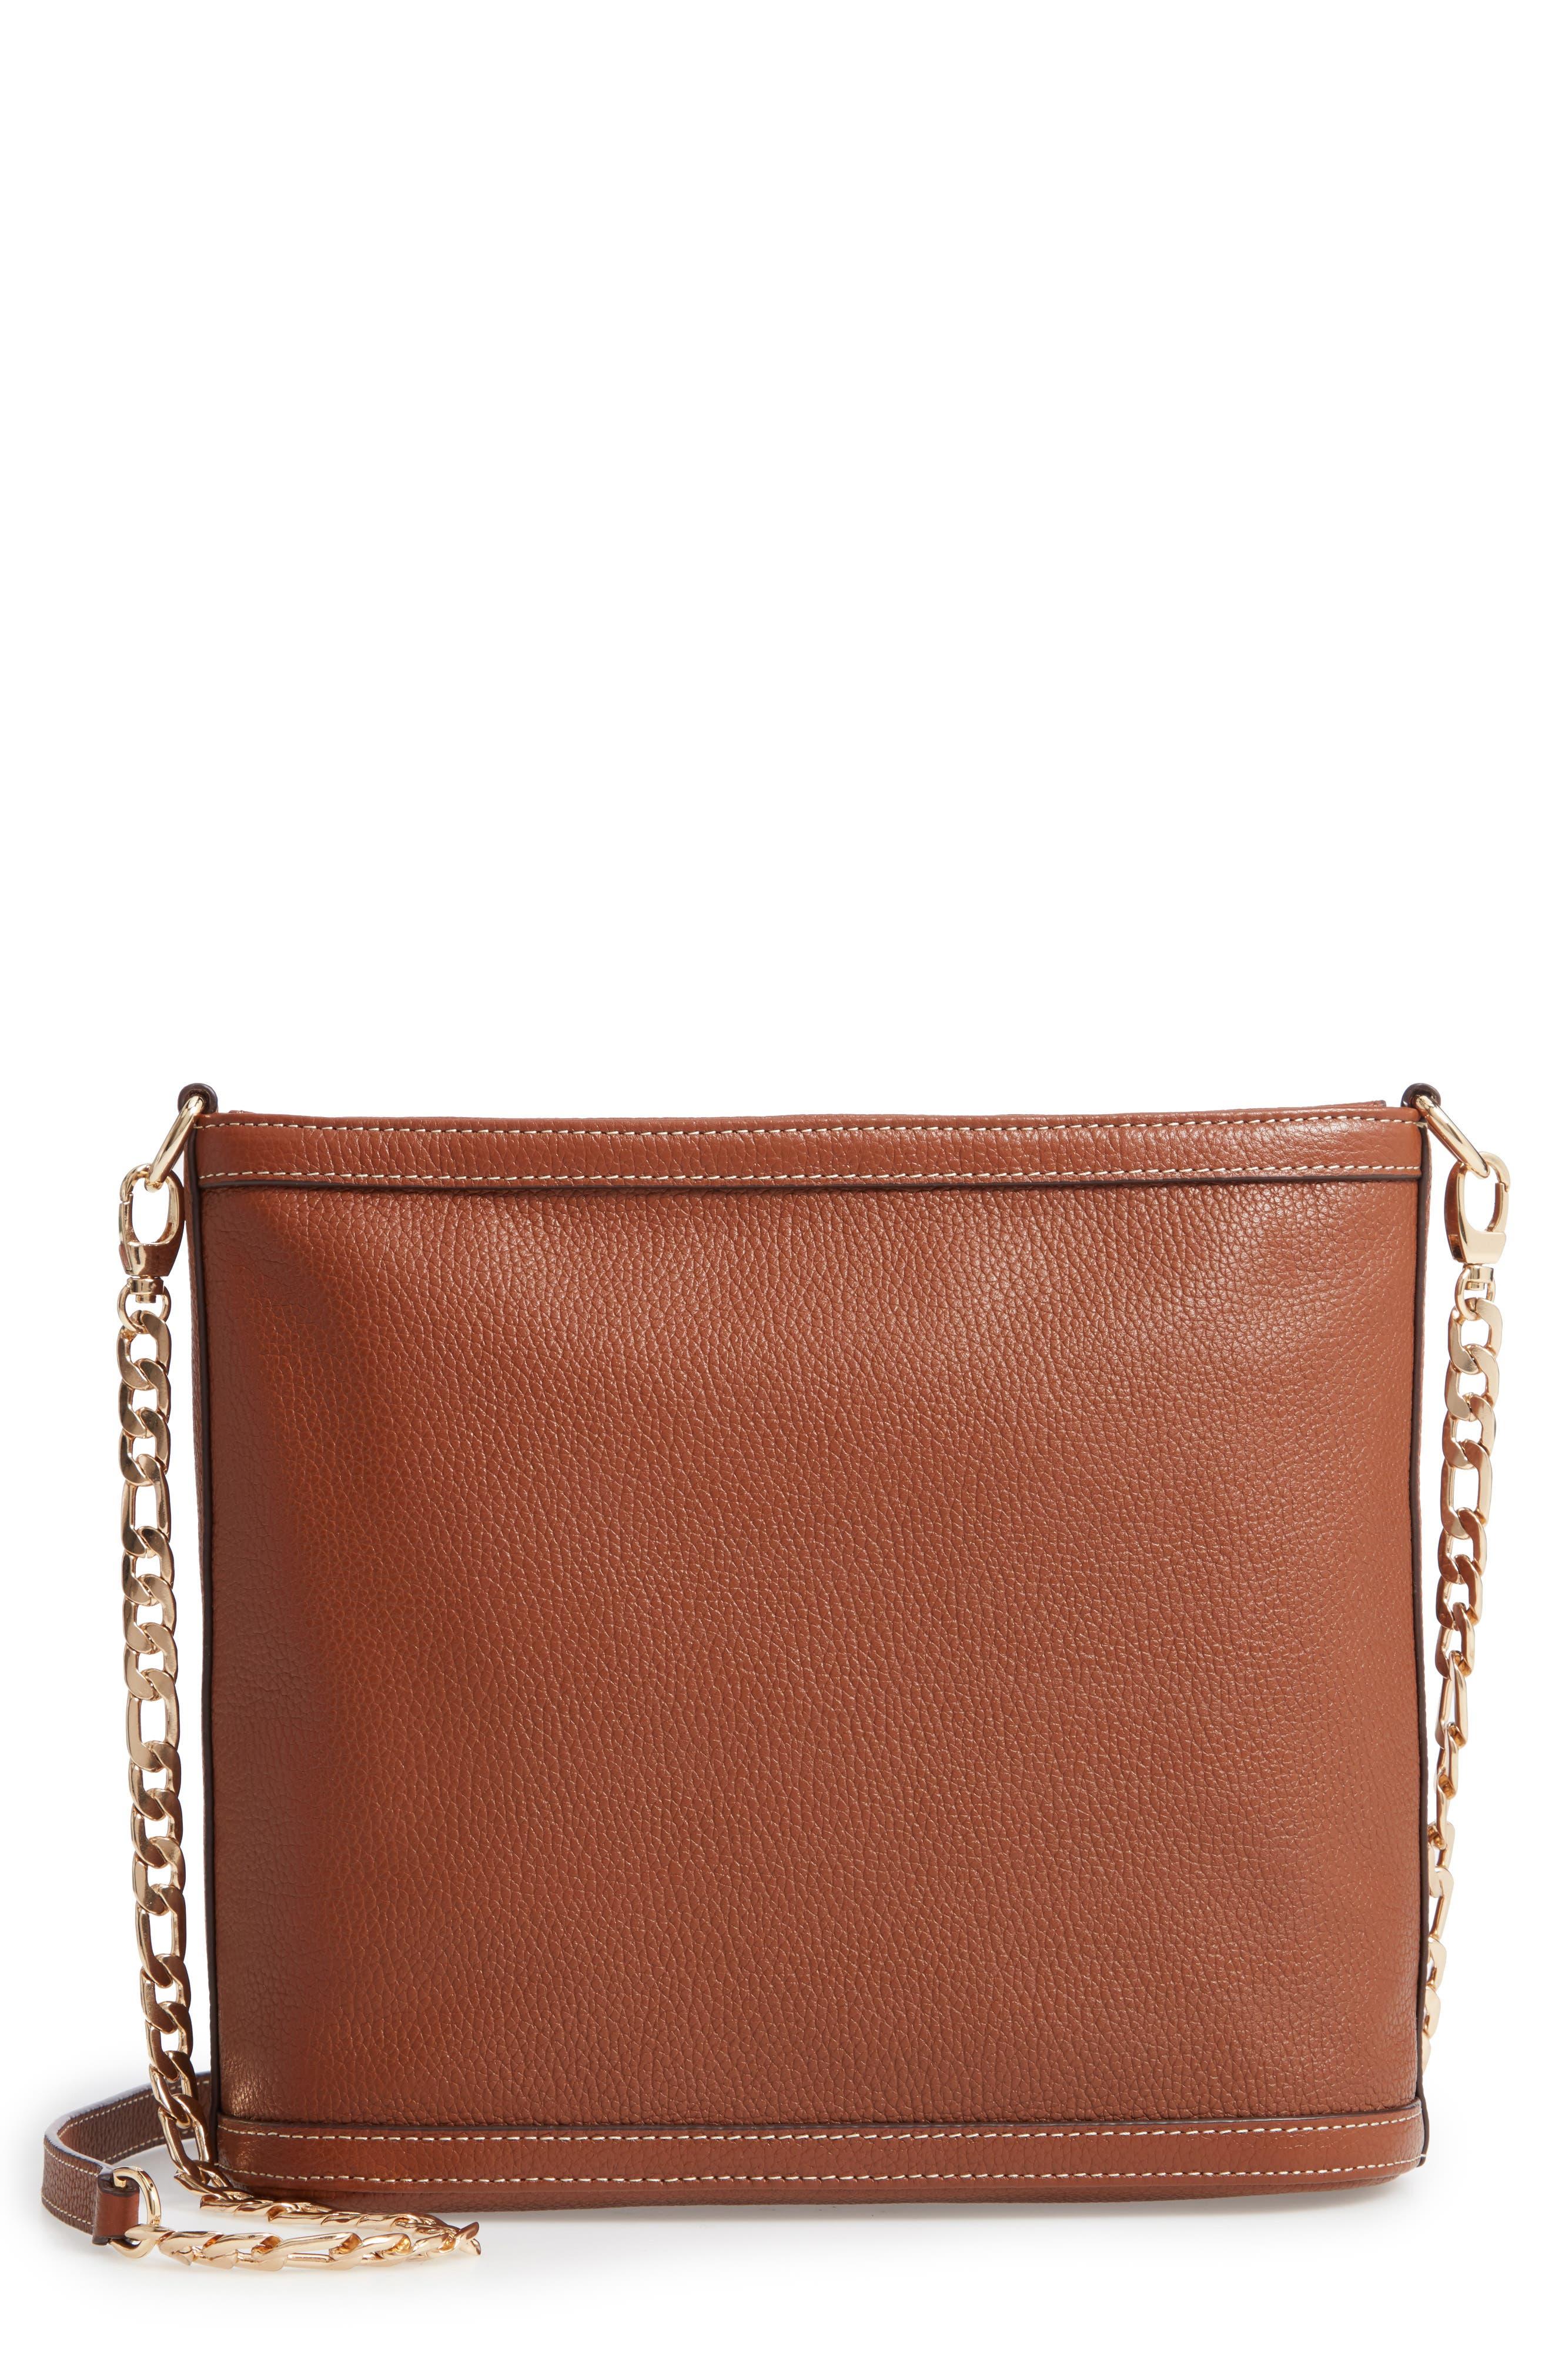 NORDSTROM Maribel Leather Crossbody Bag, Main, color, BROWN AZTEC